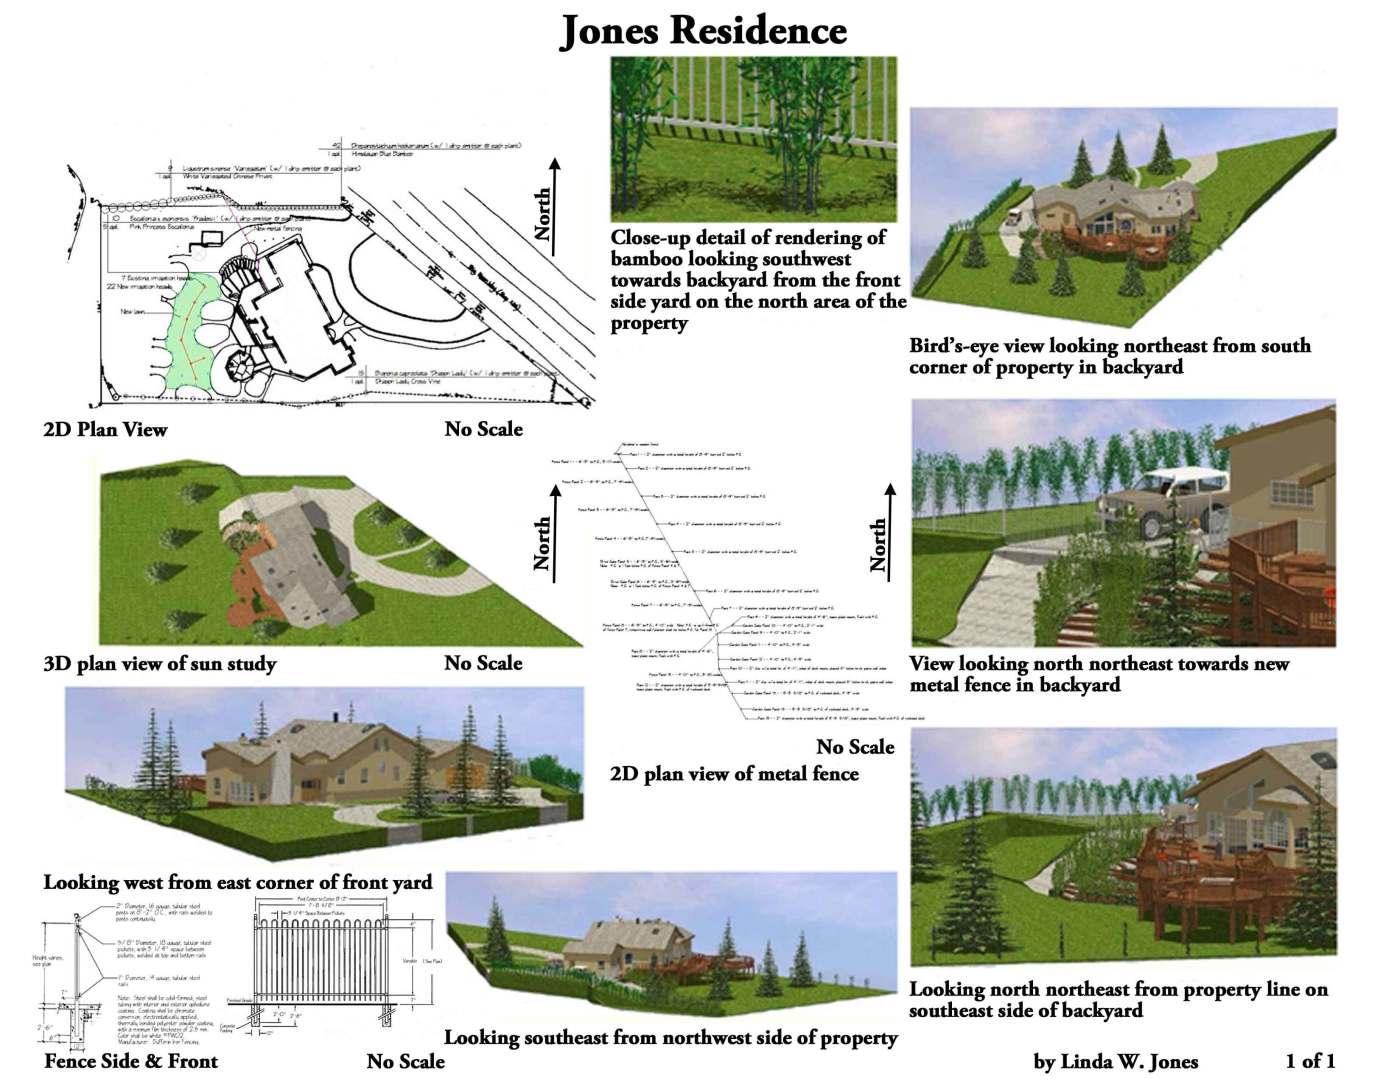 7.–Jones-Residence-lr030415